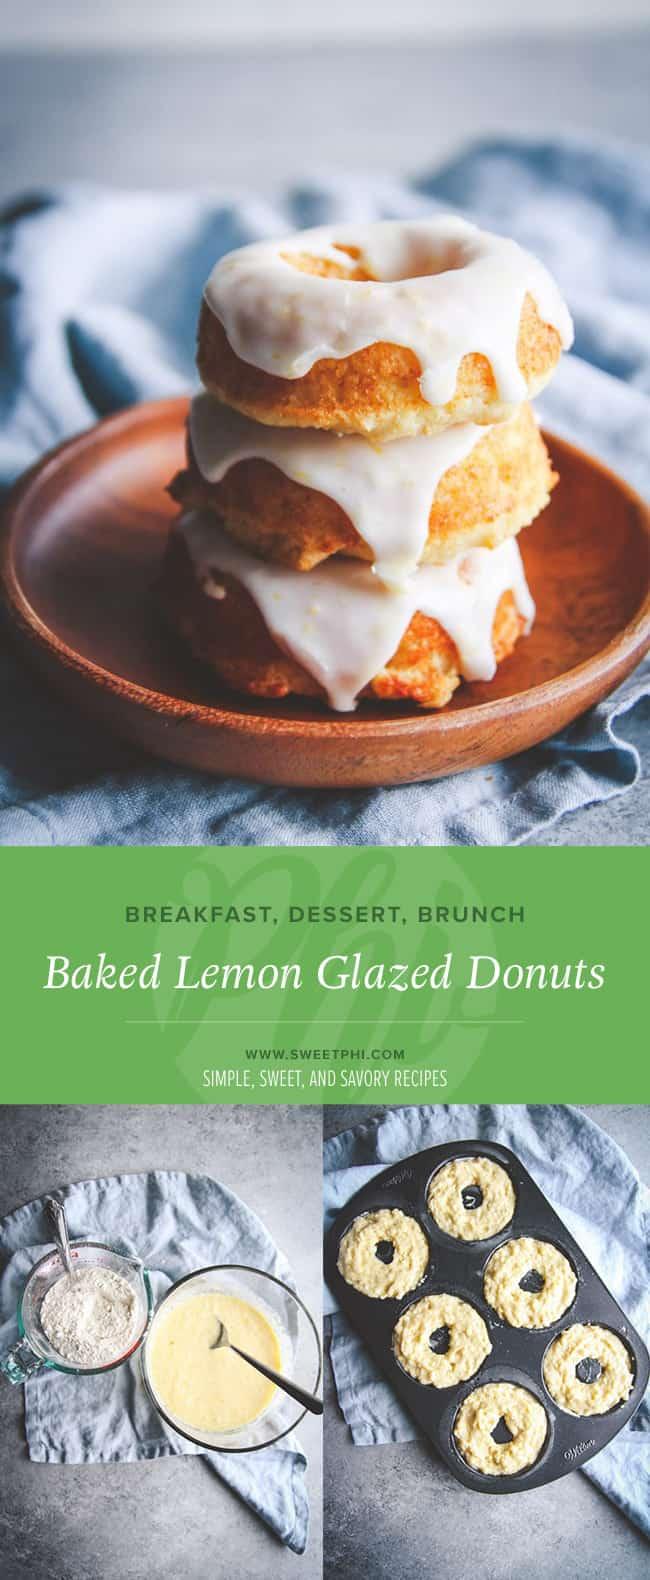 Baked lemon glazed donuts recipe, lemon donut recipe